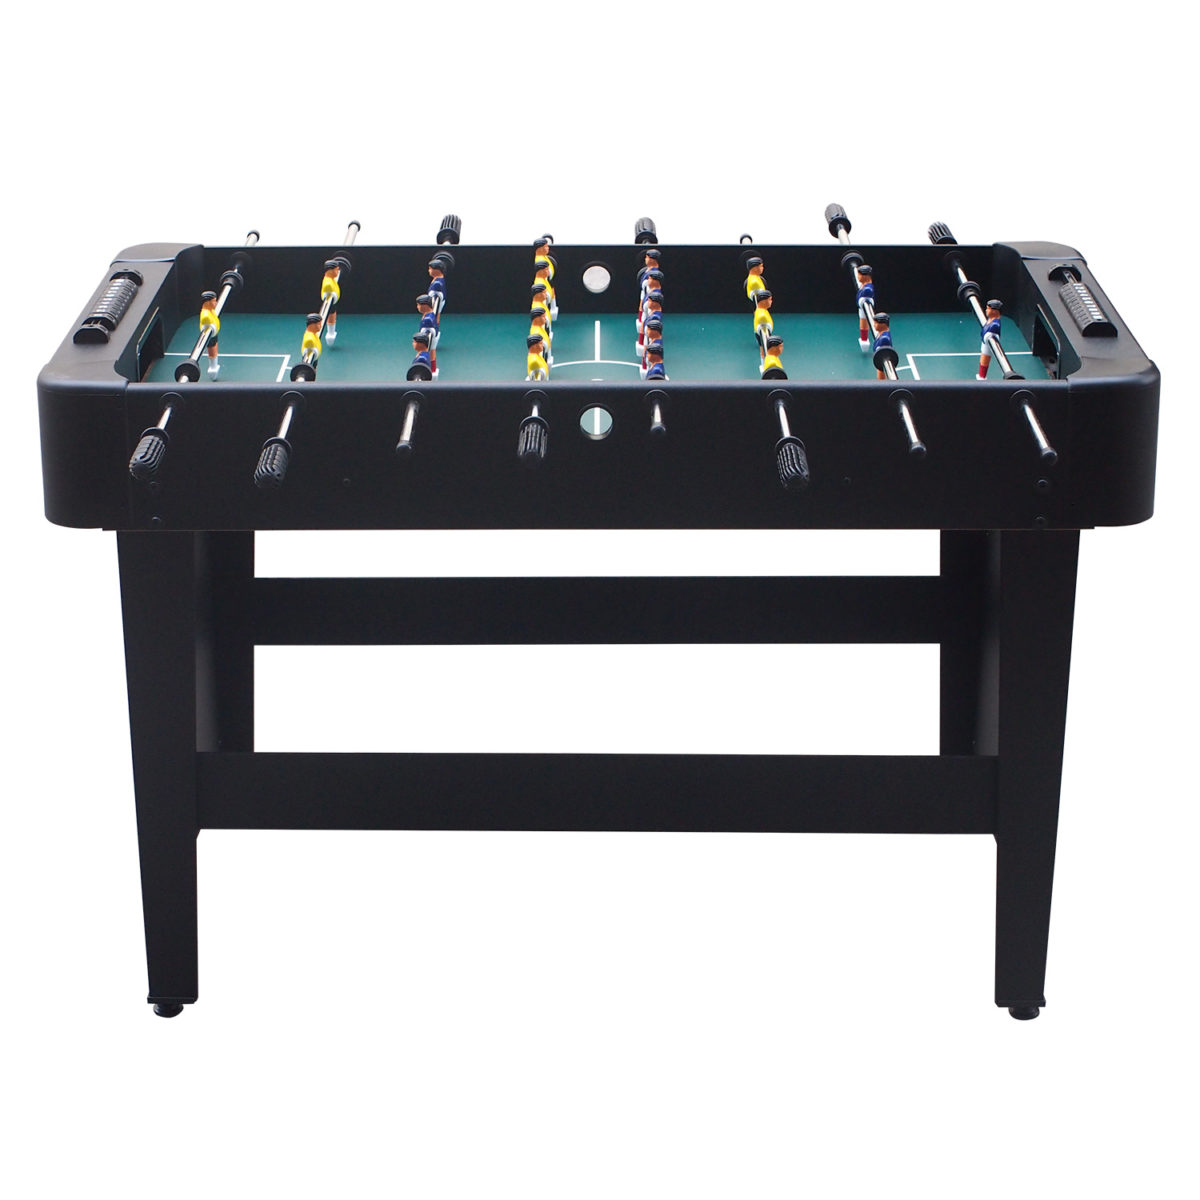 DFC TOTTENHAM Игровой стол футбол  ES-ST-3011 - 2